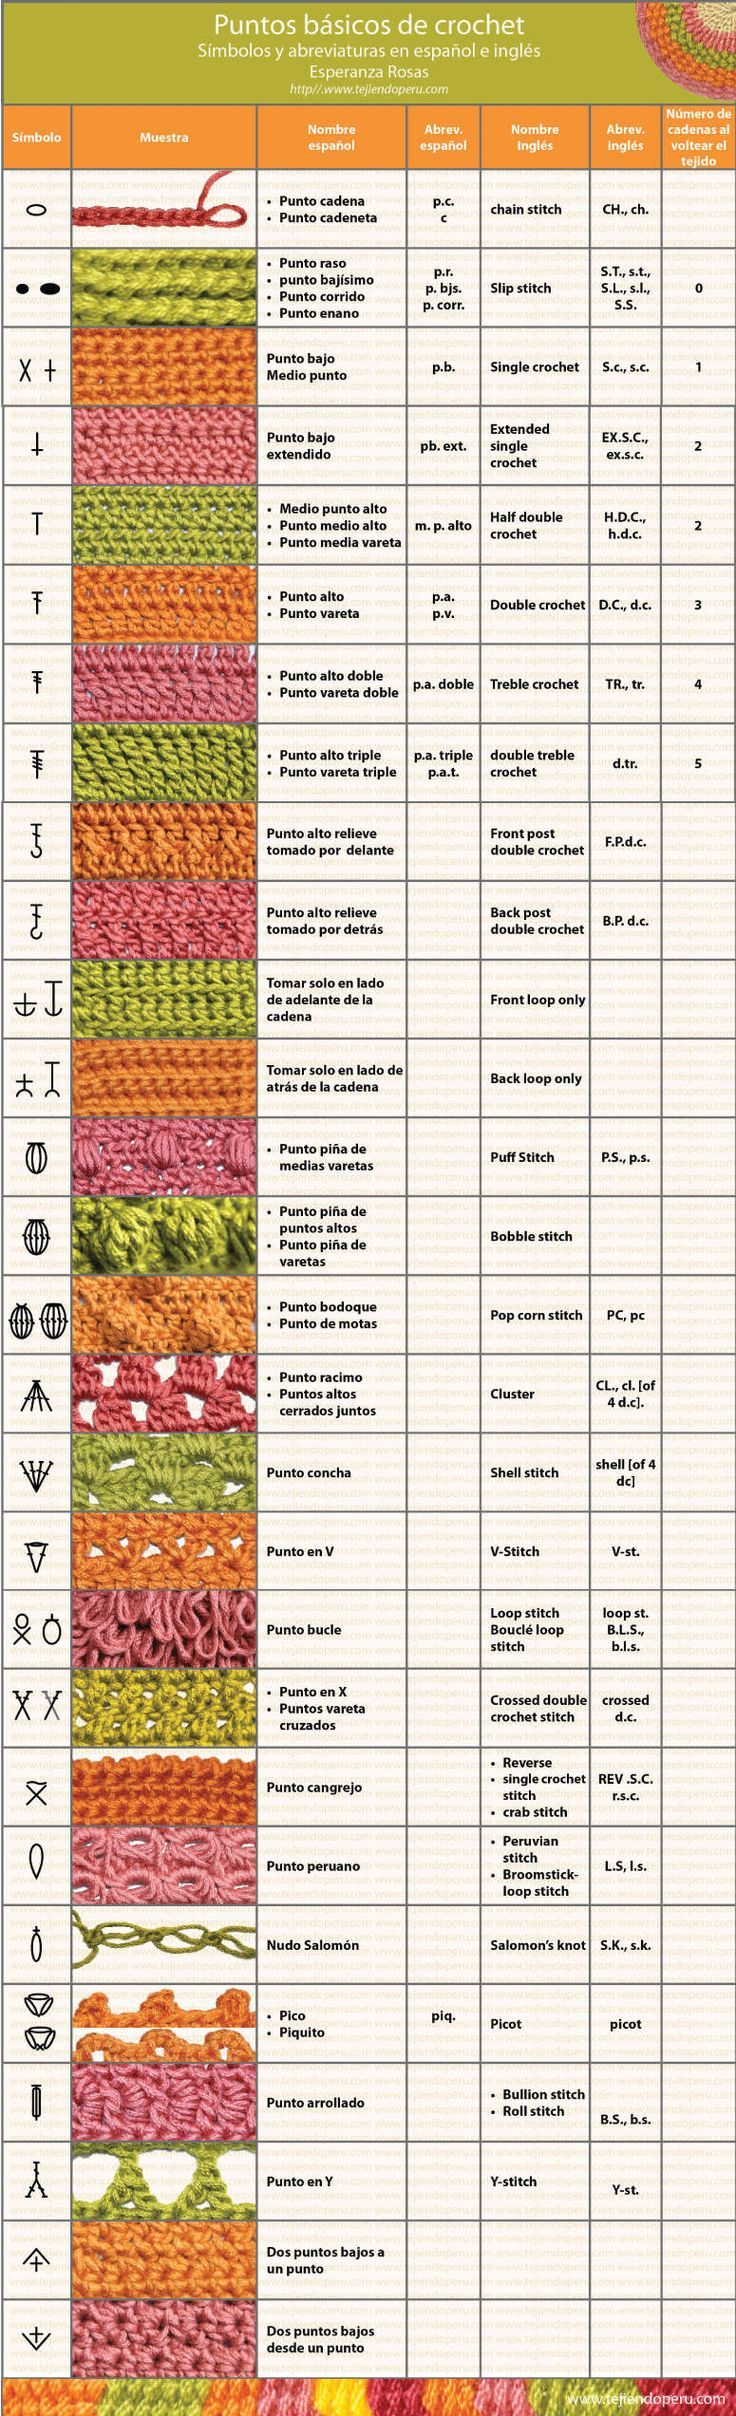 Abreviaturas puntos crochet ✿⊱╮Teresa Restegui http://www.pinterest.com/teretegui/✿⊱╮: